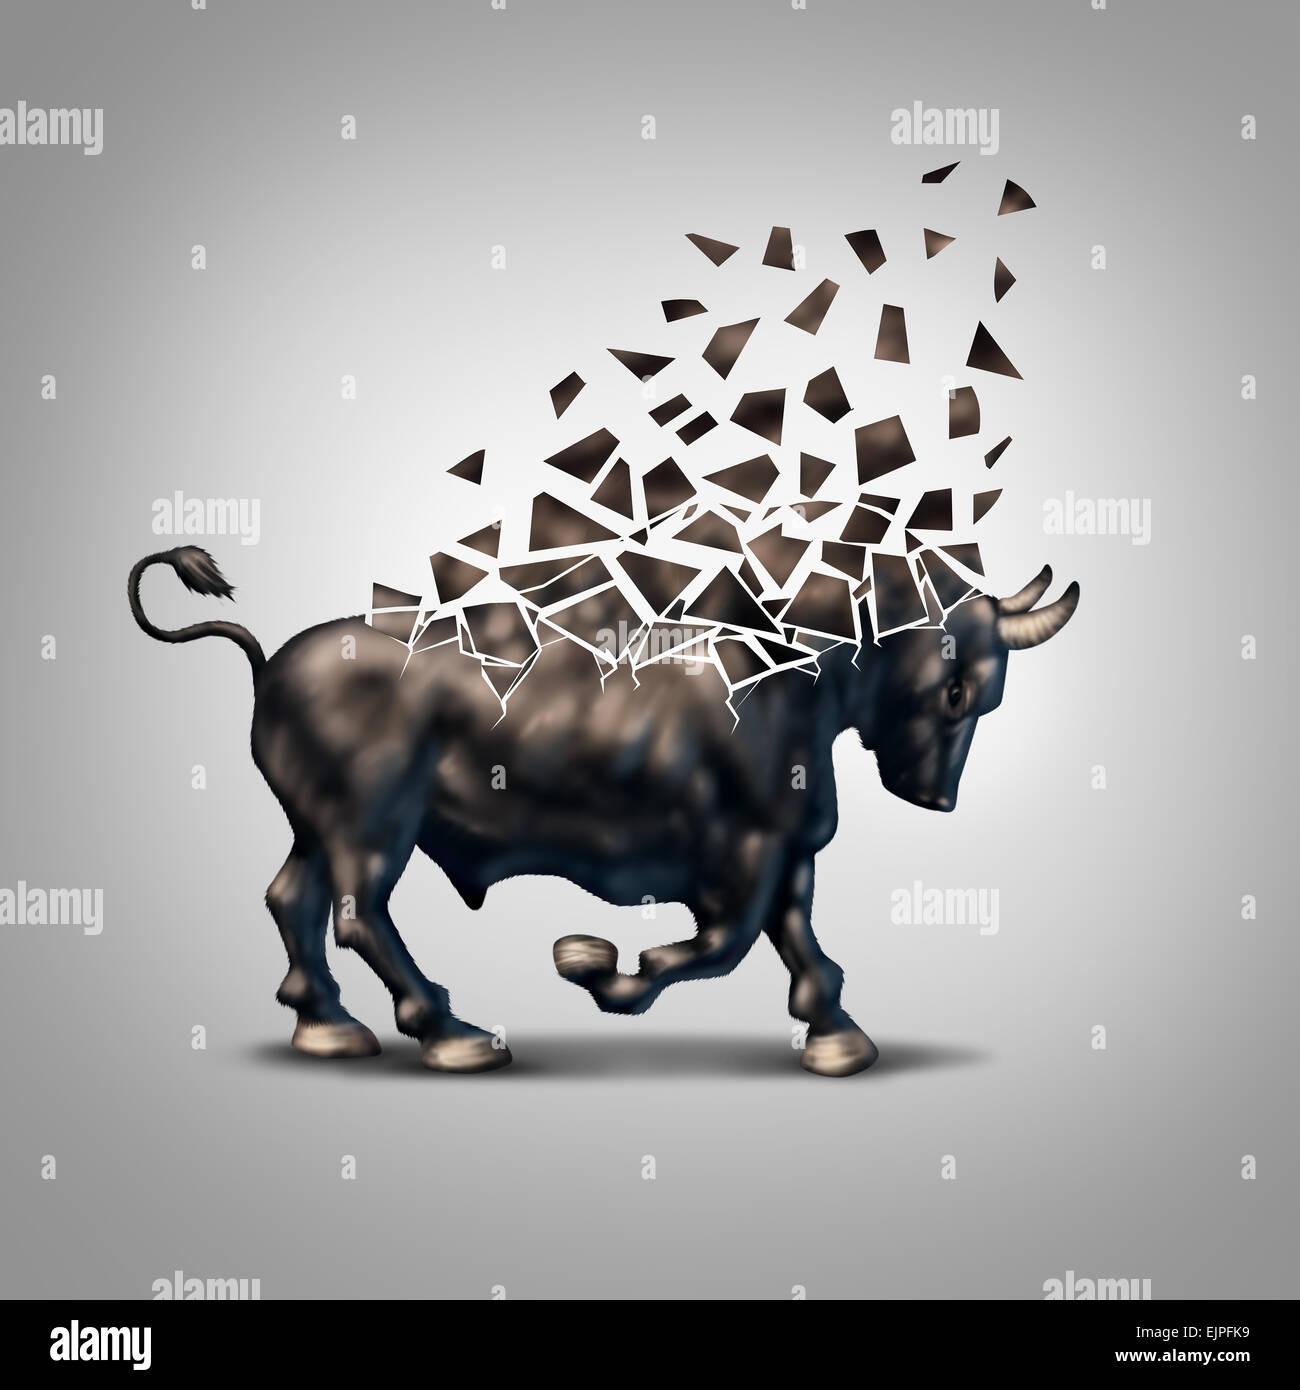 Frágil mercado bull crisis financiera concepto como símbolo económico para desmenuzar proyección Imagen De Stock